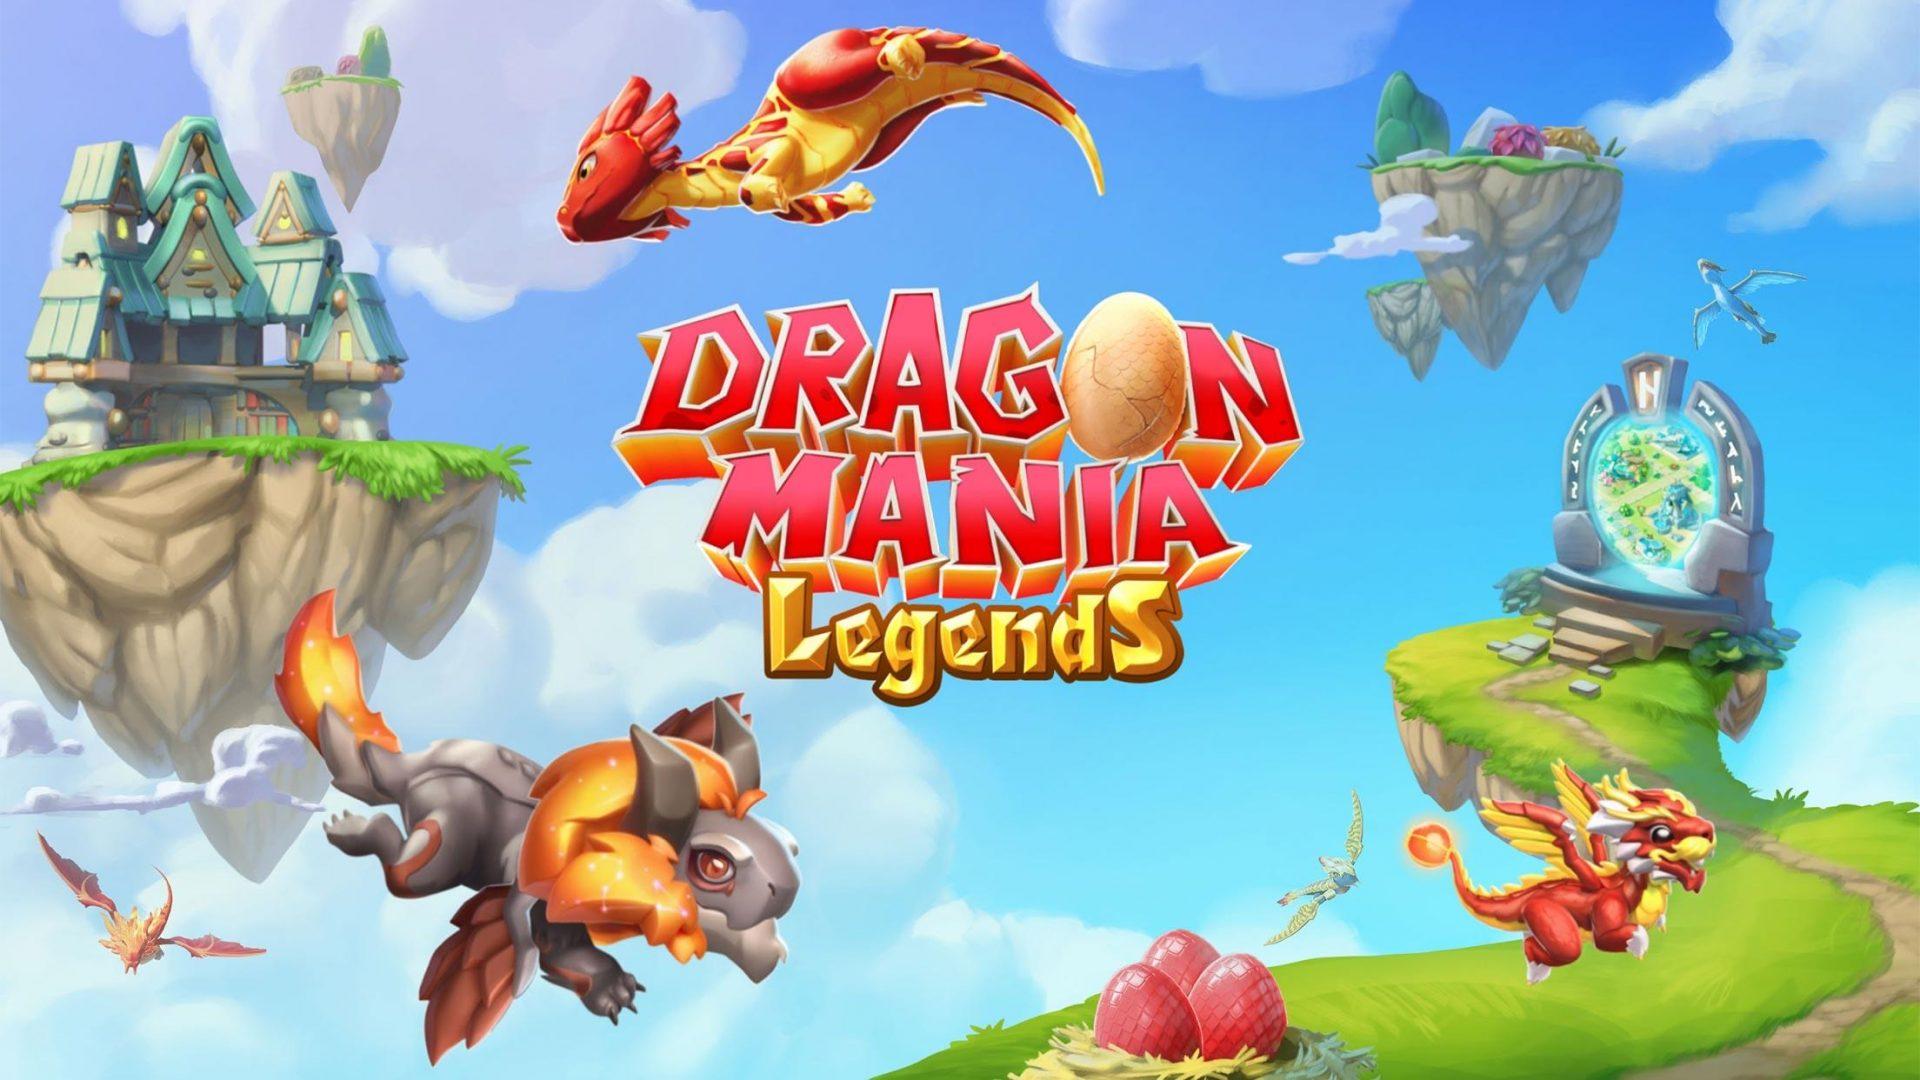 Cara Instalasi Dragon Mania Legends Apk V.4.0.0 Offline Terbaru